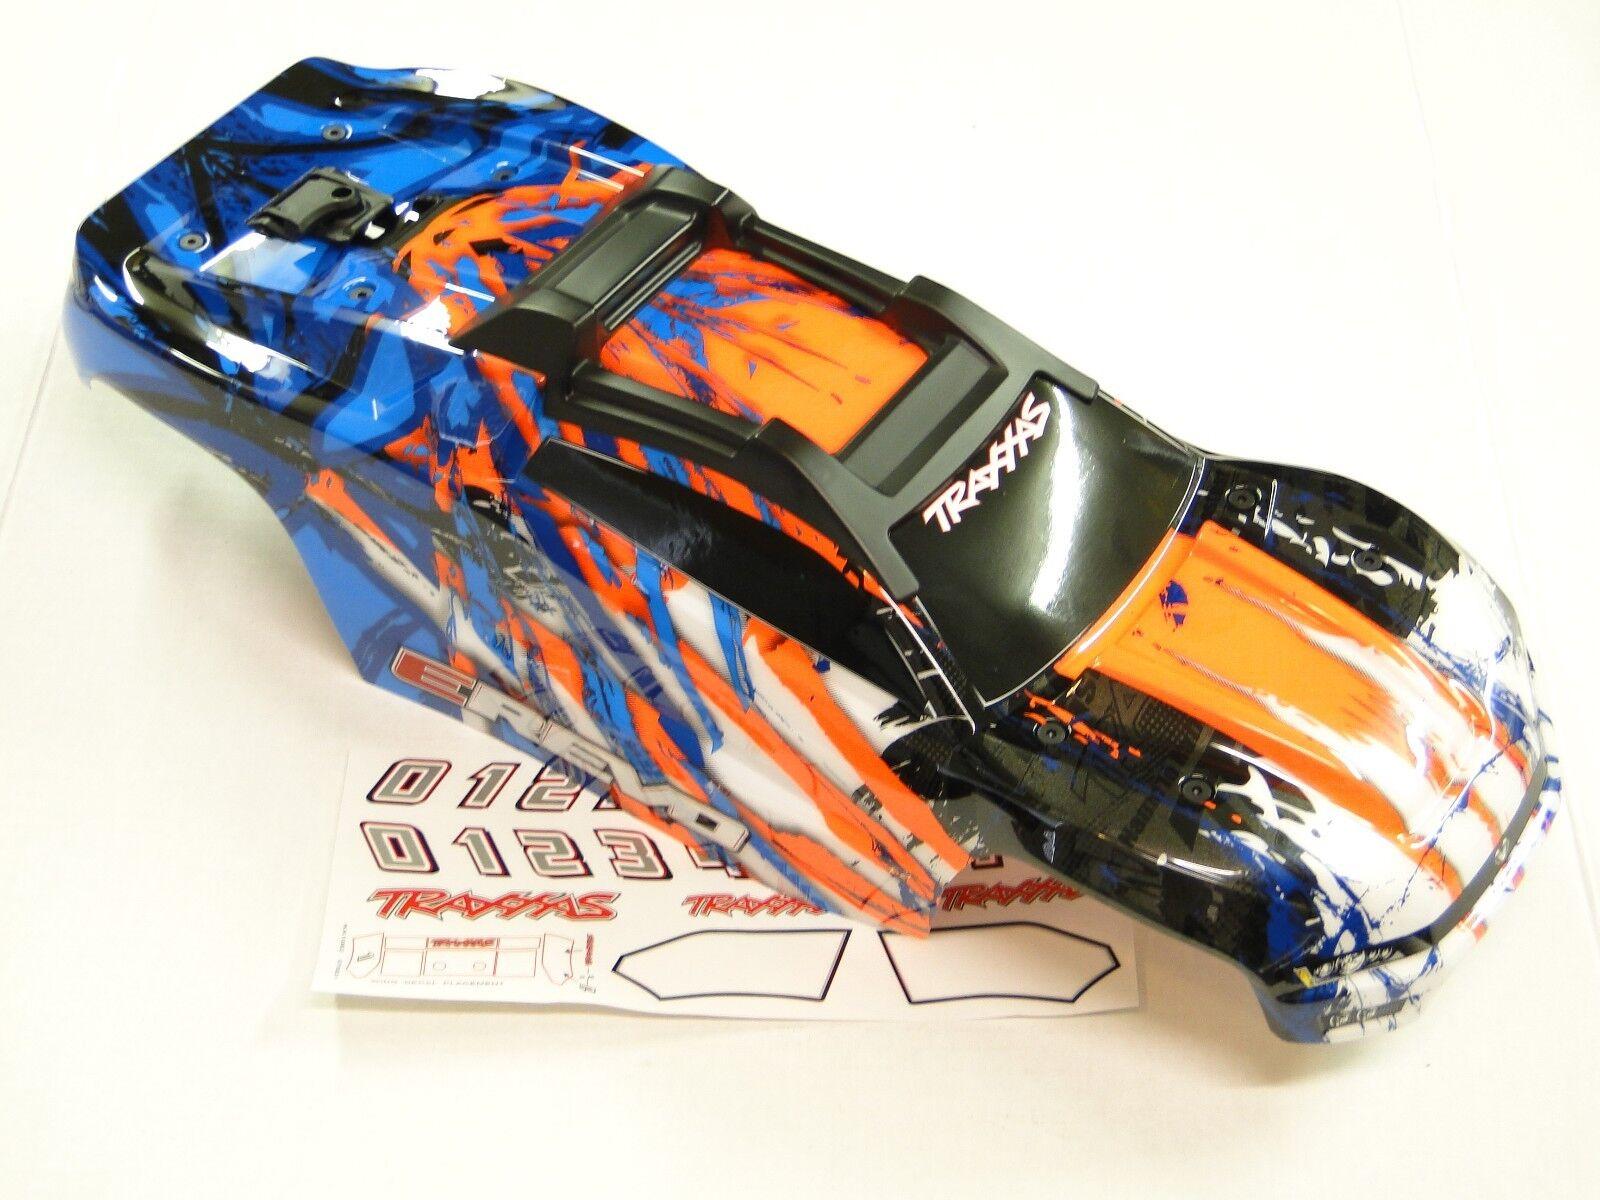 NEW TRAXXAS E-REVO 2.0 VXL 1/10 Body Factory Painted arancia /bianca Cliples RRE6O